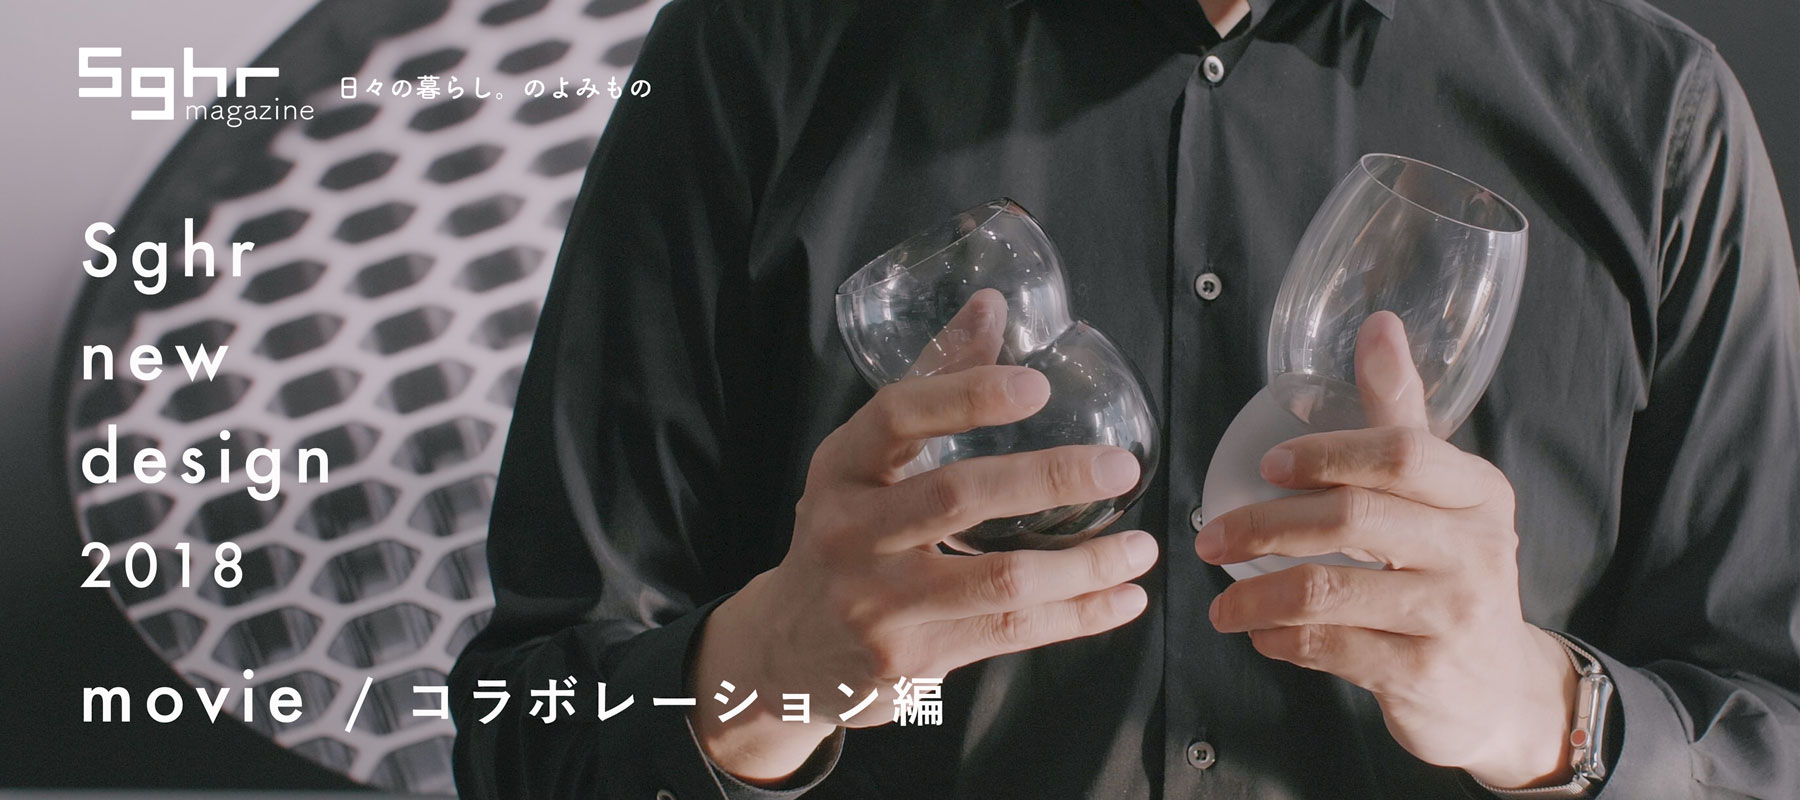 Sghr new design 2018 movie-コラボレーション編